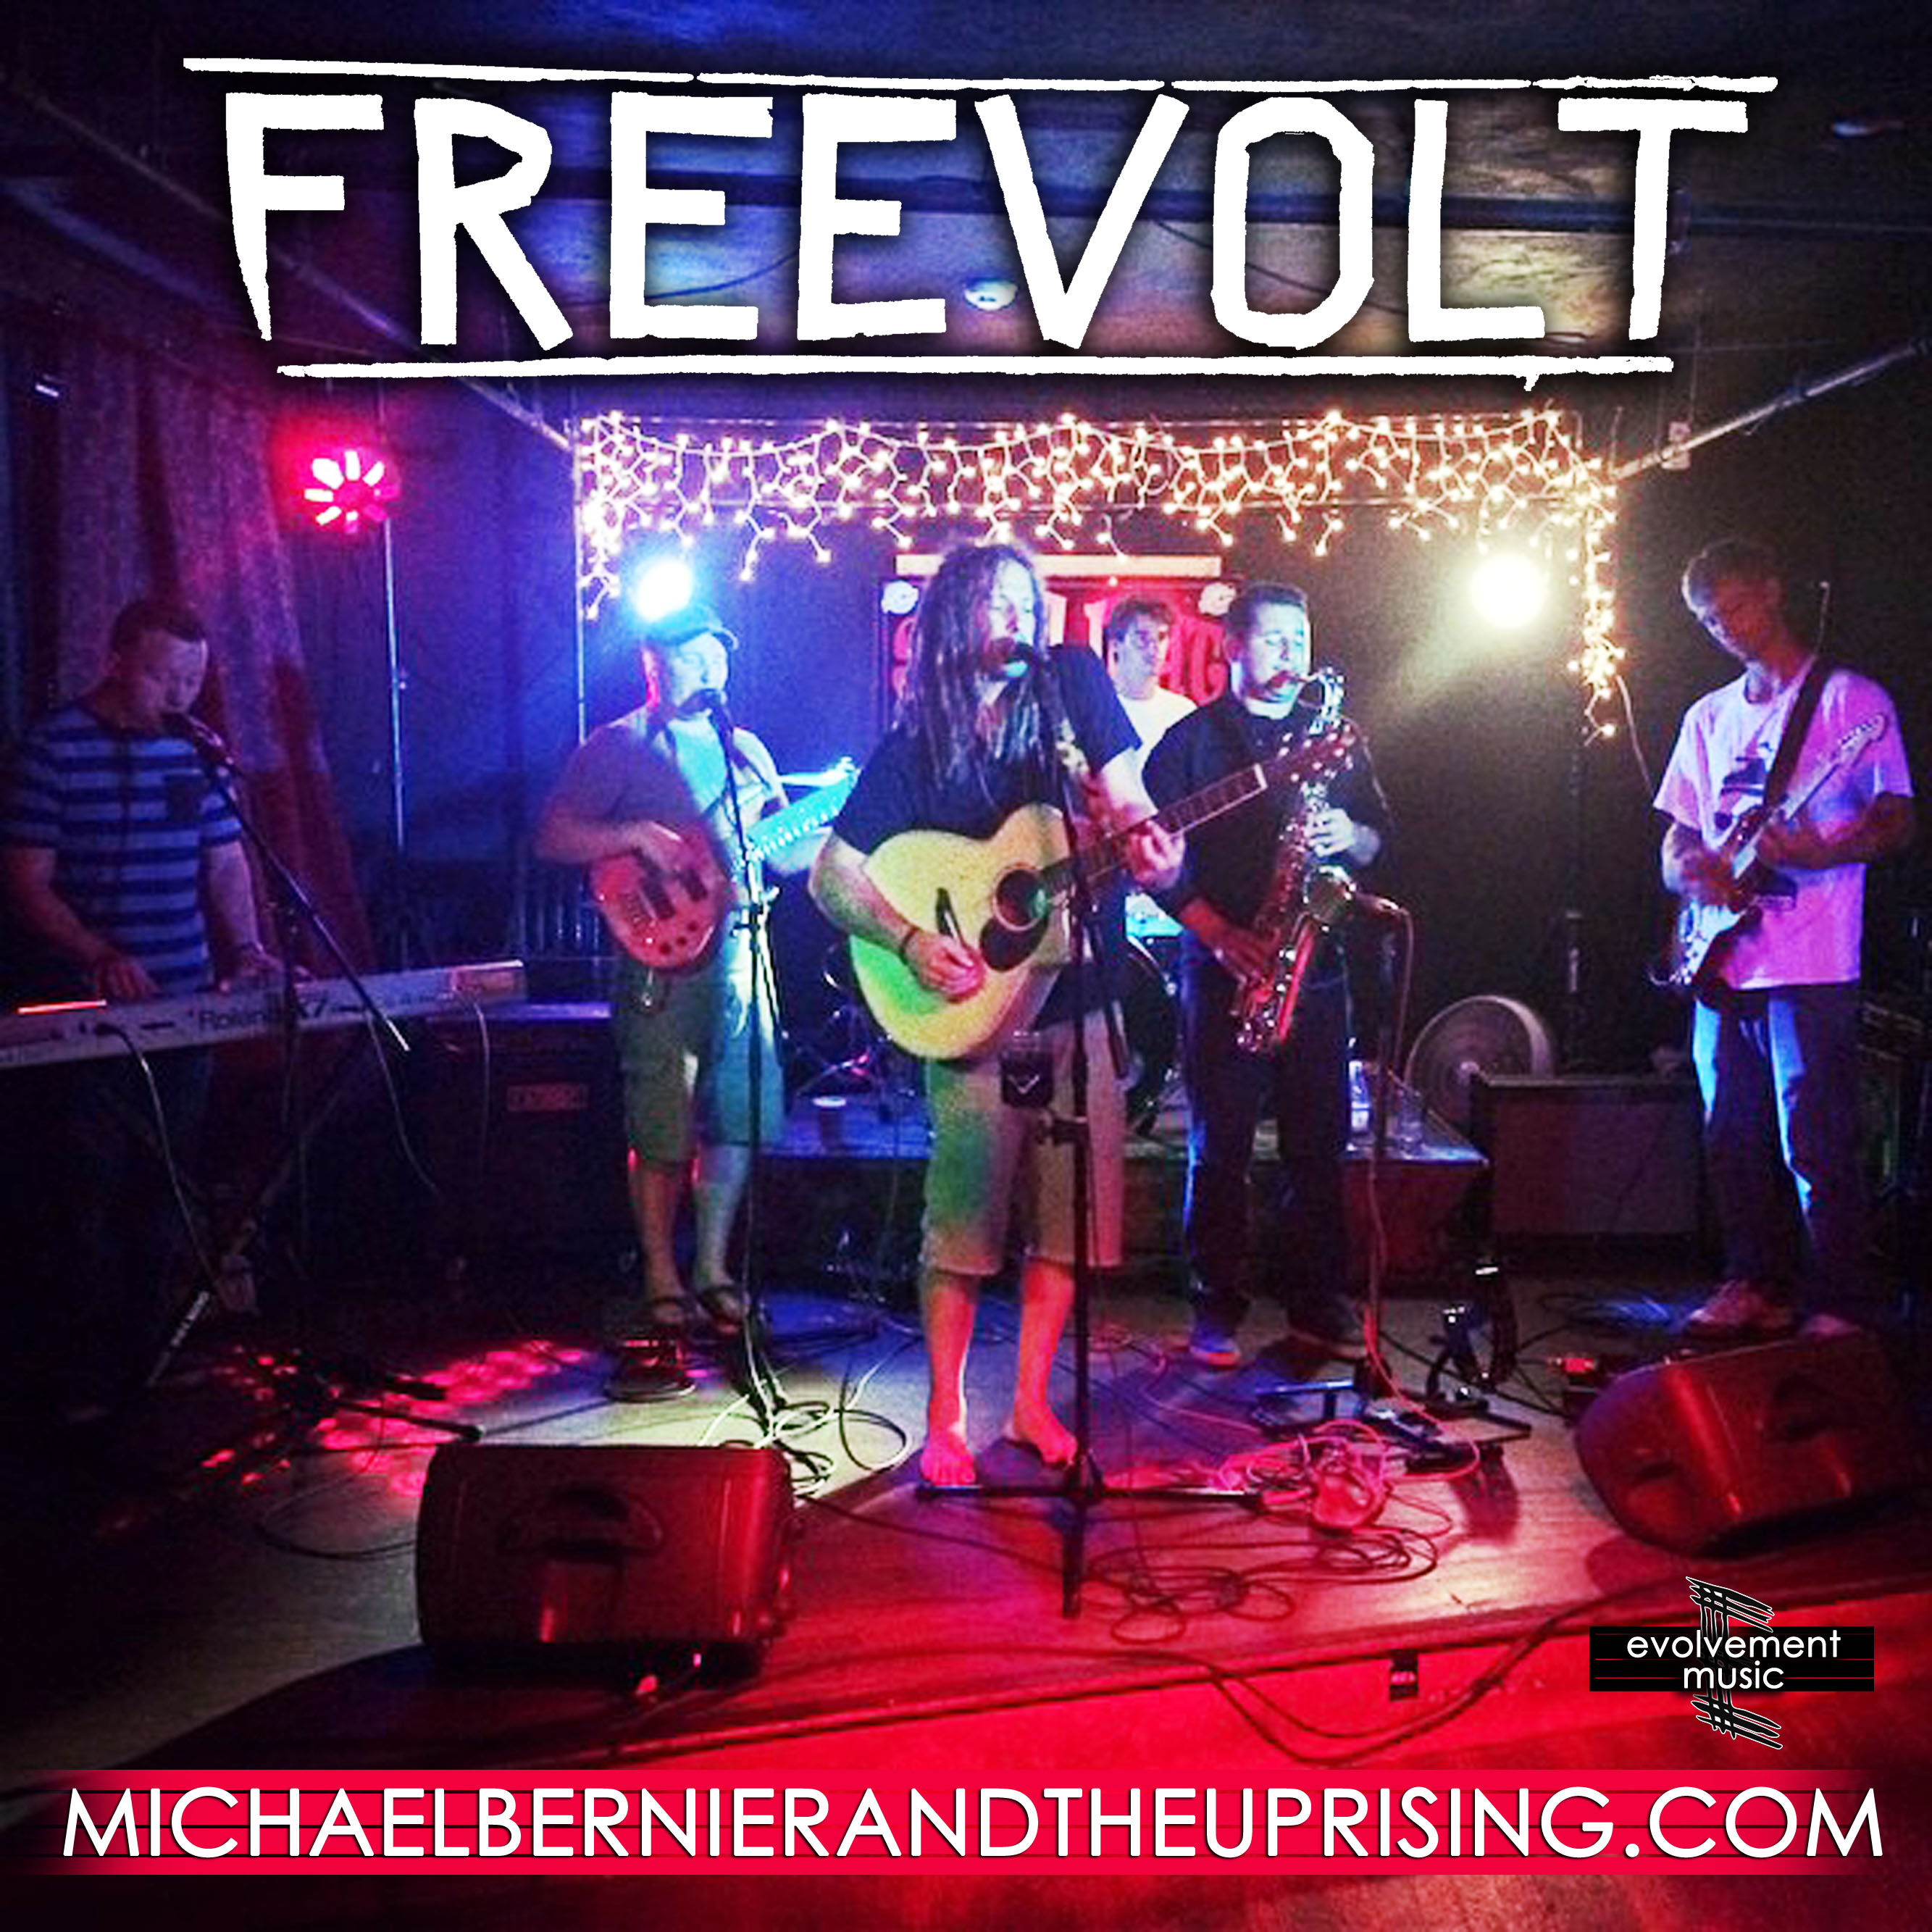 FREEVOLT+at+Spotlight+Beverly+Full+Band+Promo+Image.jpg